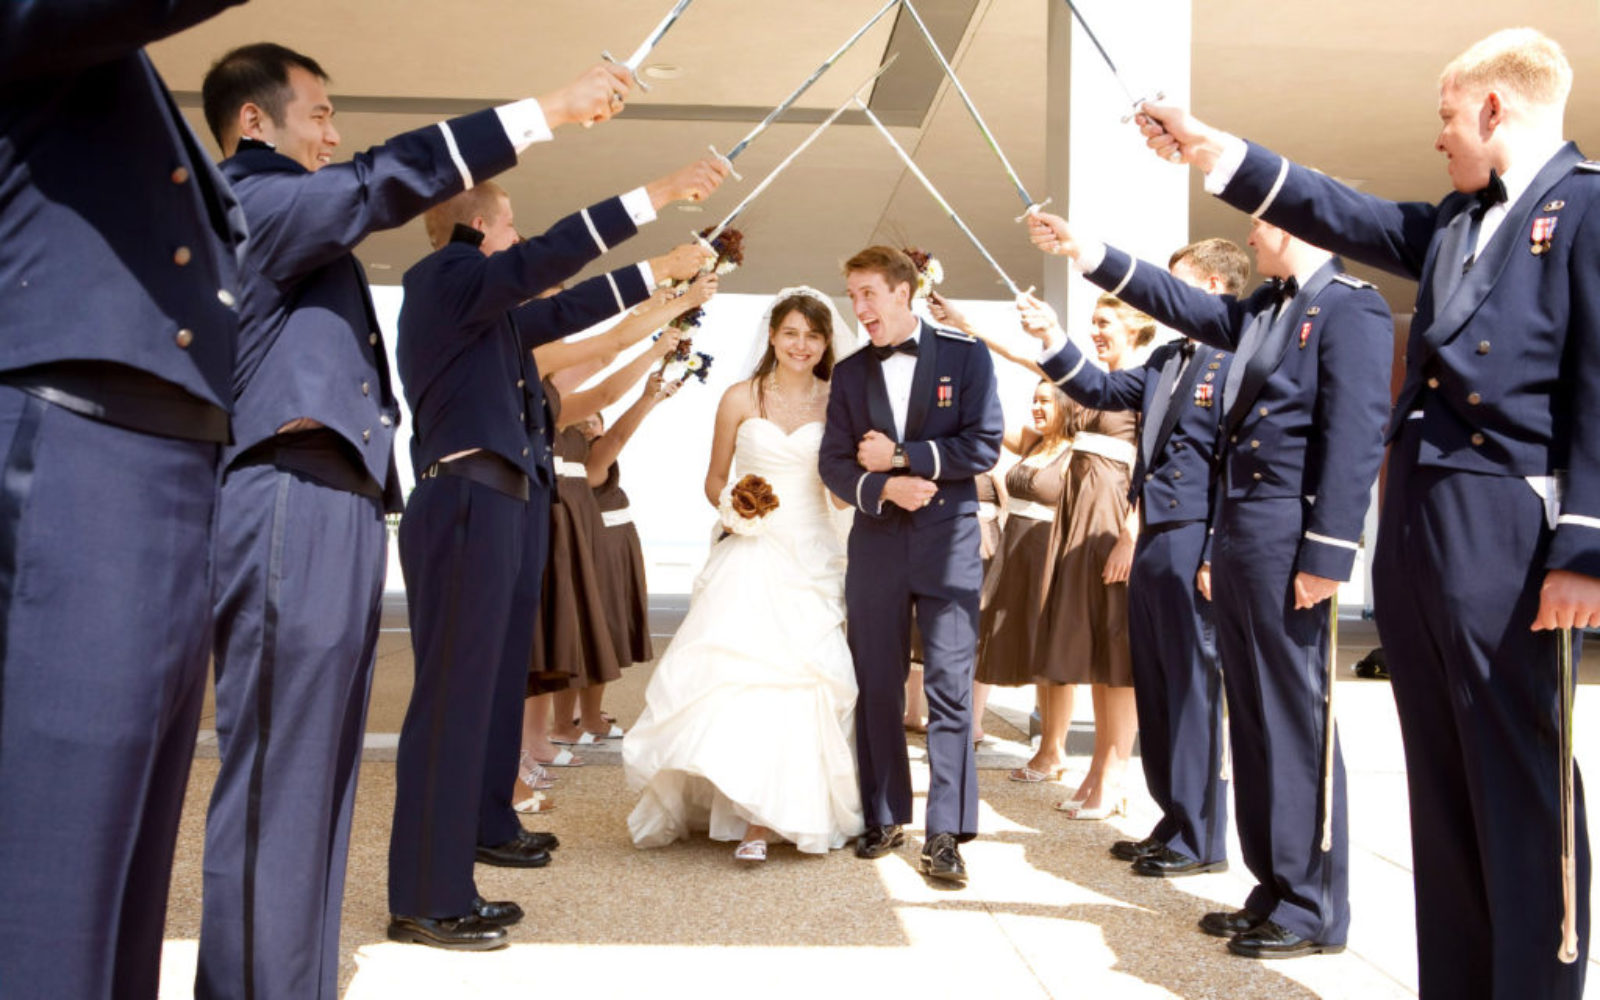 weddingphotographycoloradosprings_59-1024x640